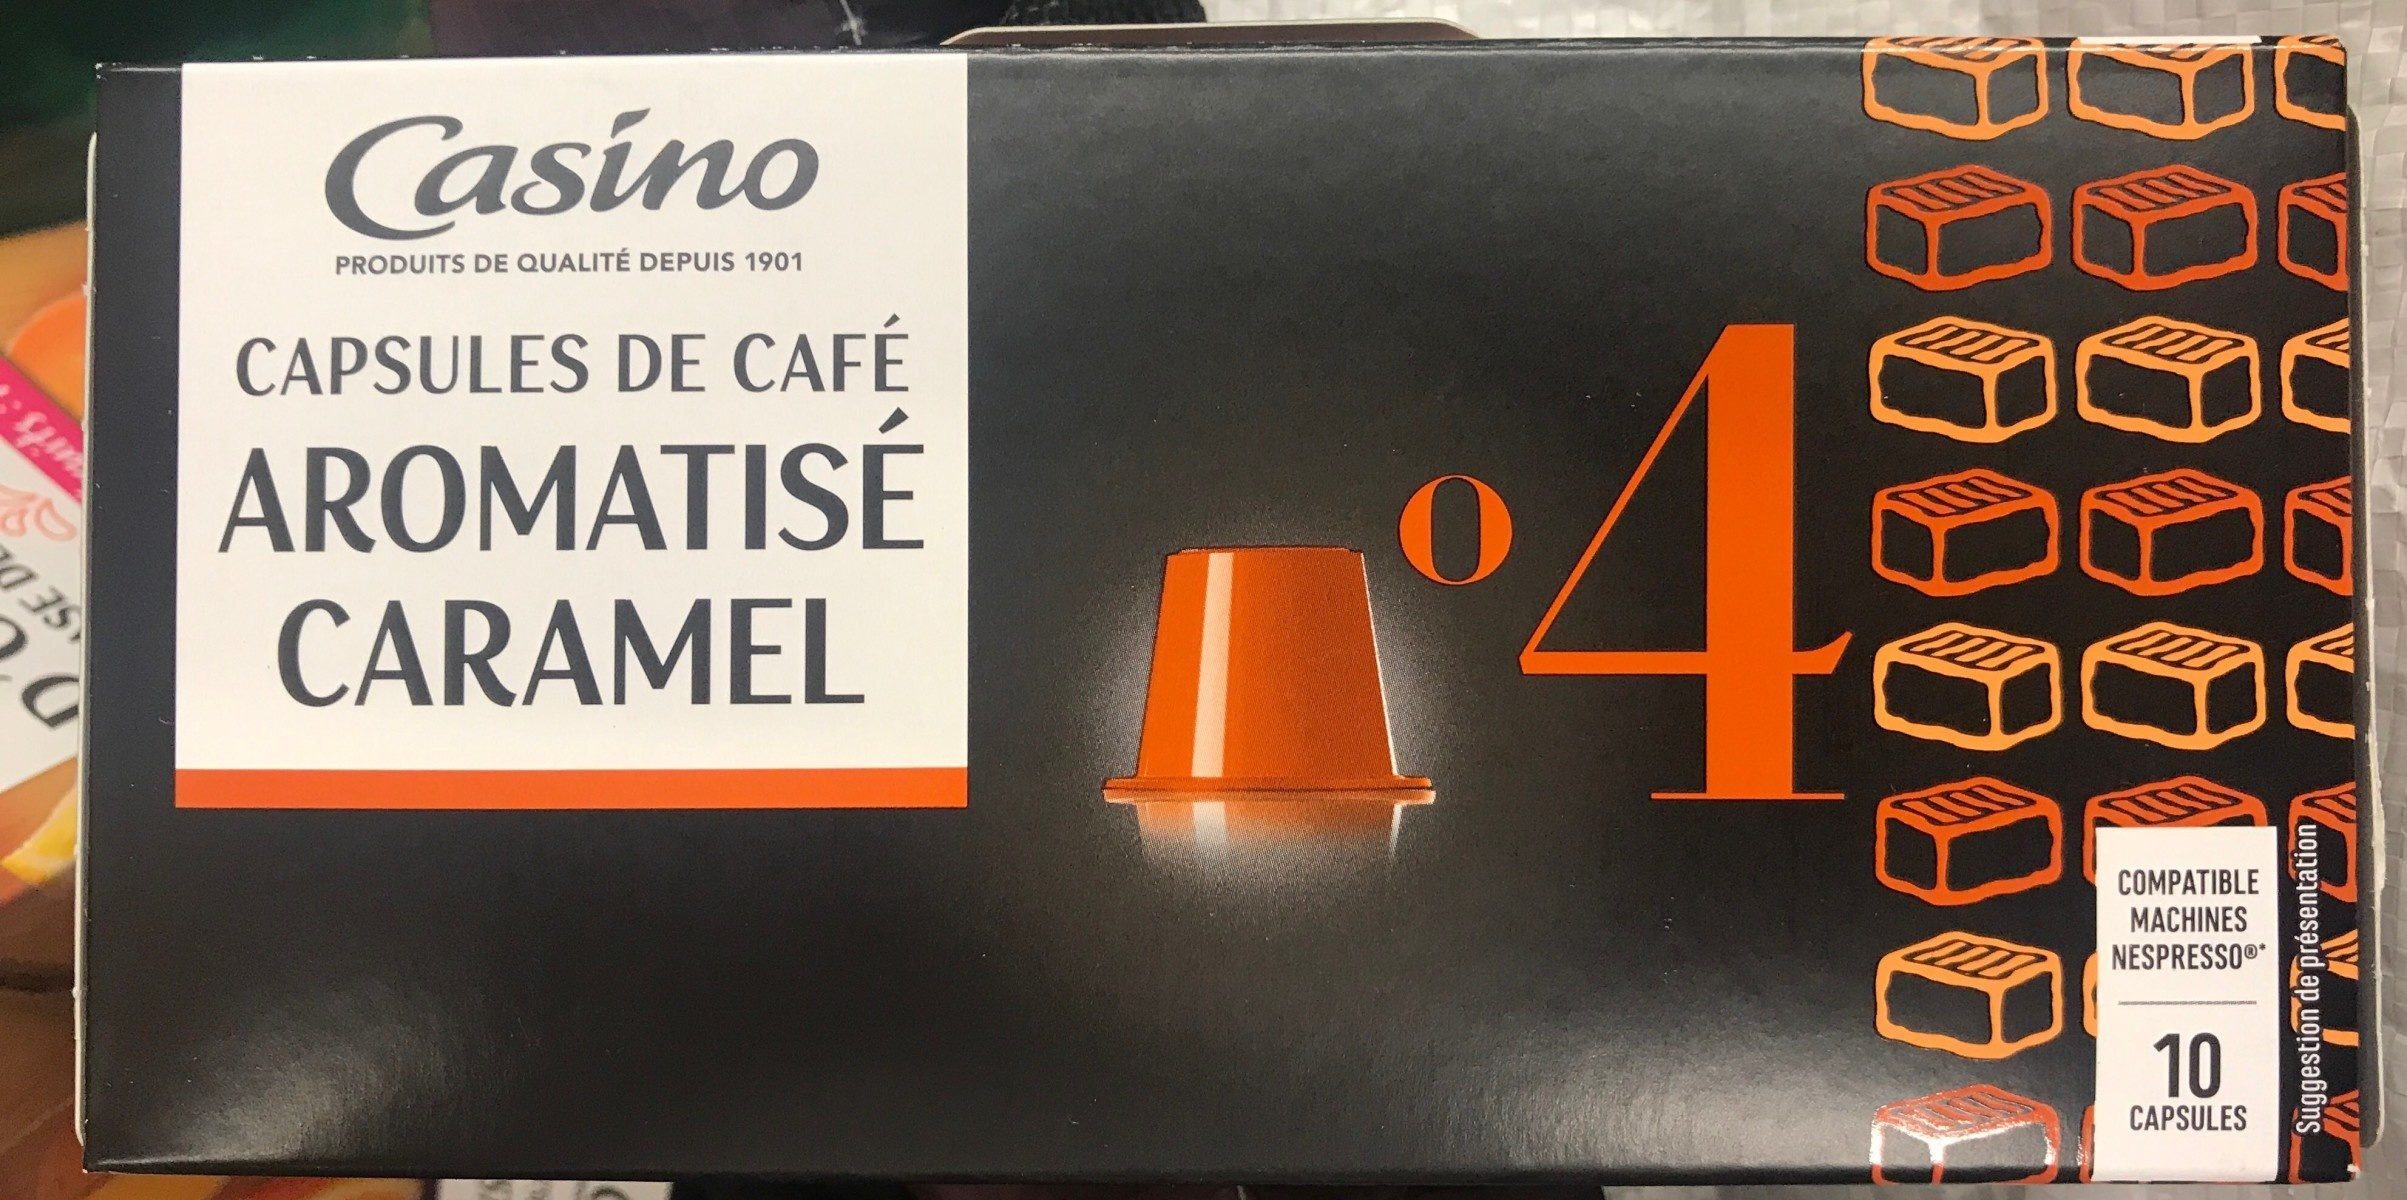 Capsules Café aromatisé caramel x10 compatible Nespresso - Product